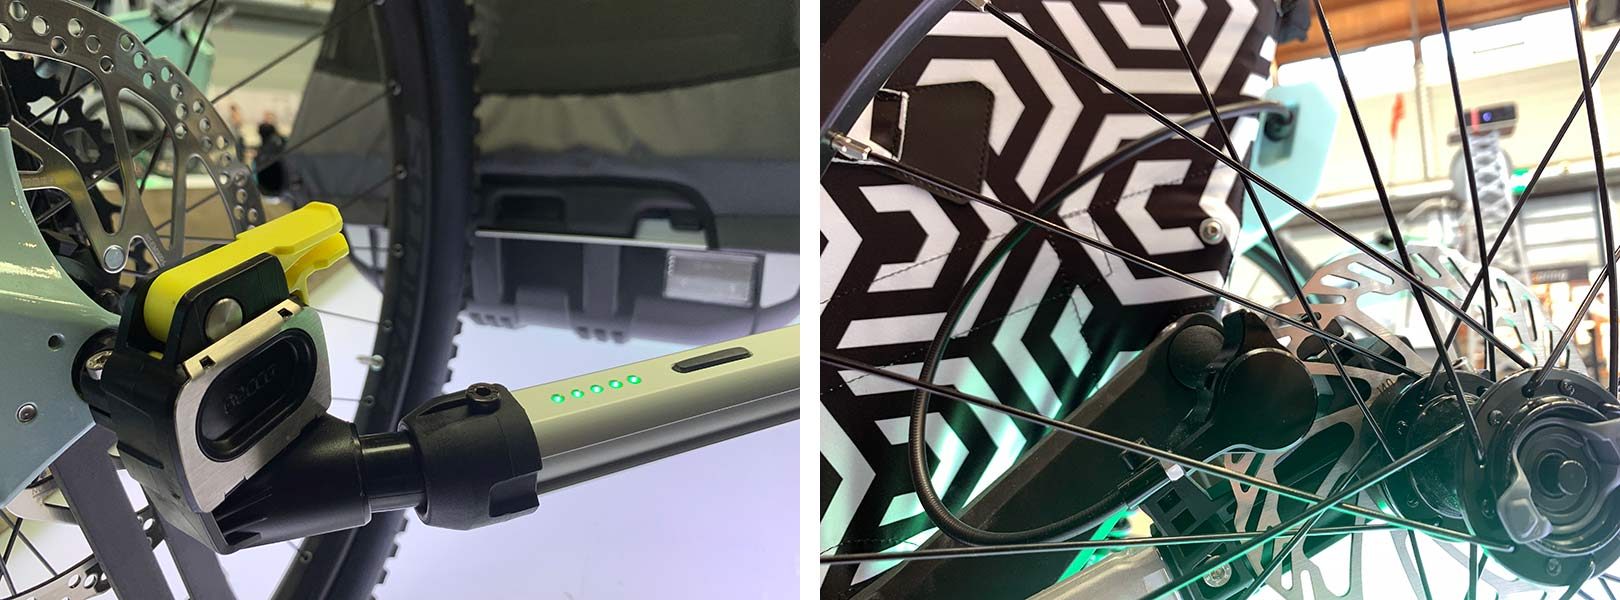 closeup details of the leggero overrun automatic braking prototype for kids bicycle trailers